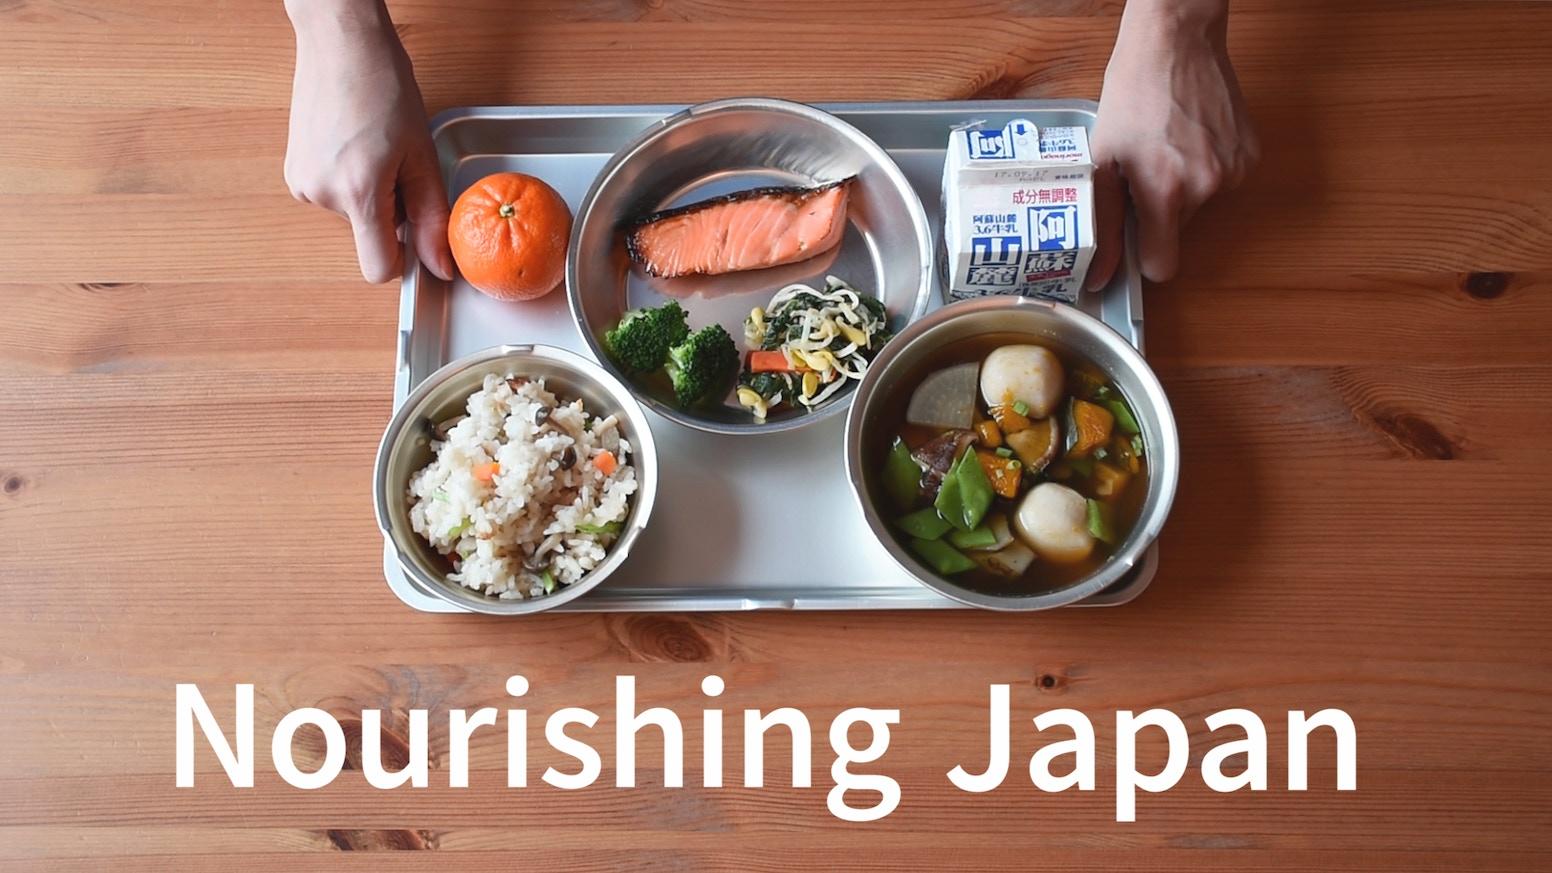 Nourishing japan by alexis kickstarter for Food s bar unloc